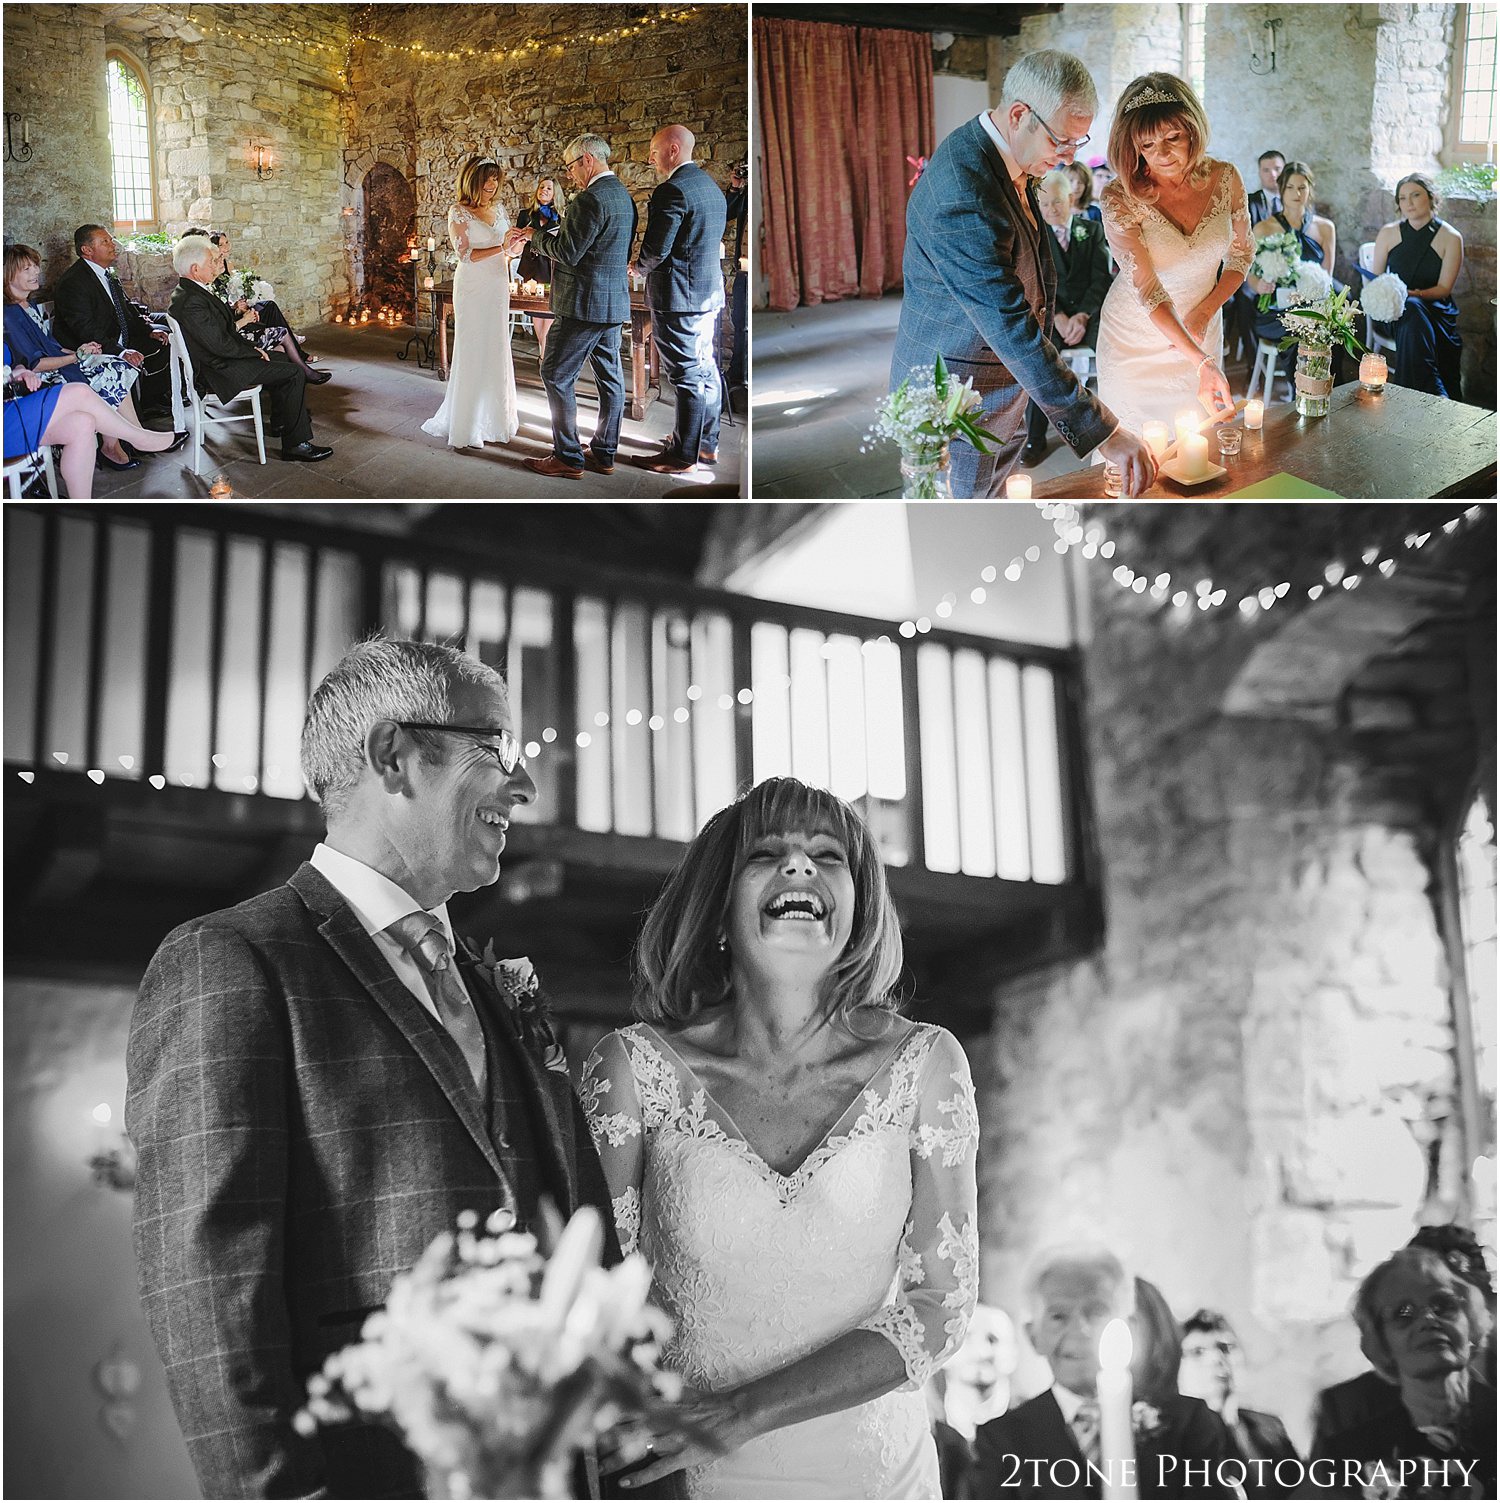 Crook Hall wedding photographer 017.jpg